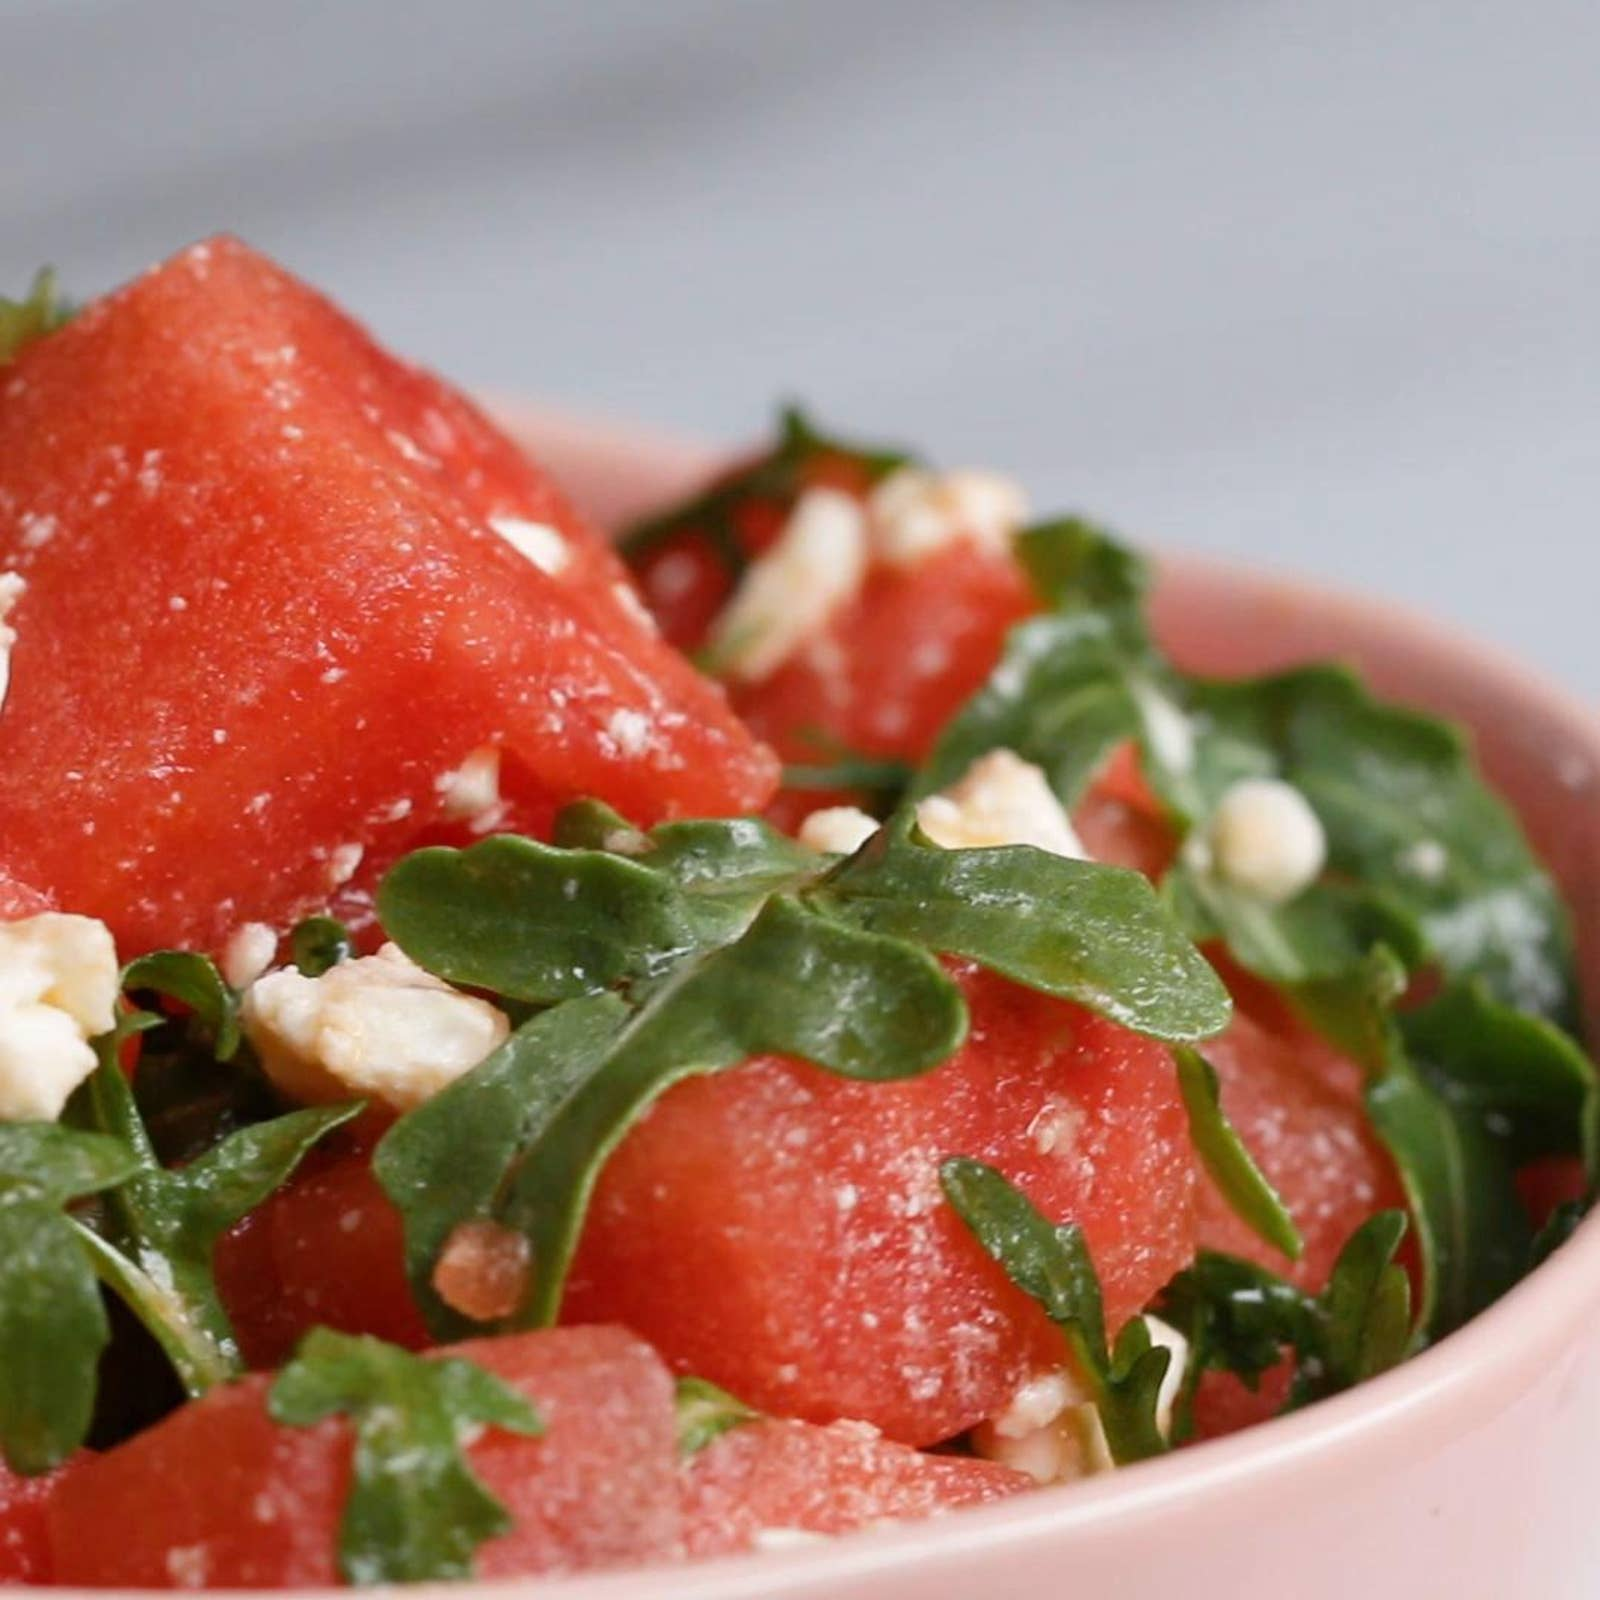 Watermelon Salad With Arugula And Feta